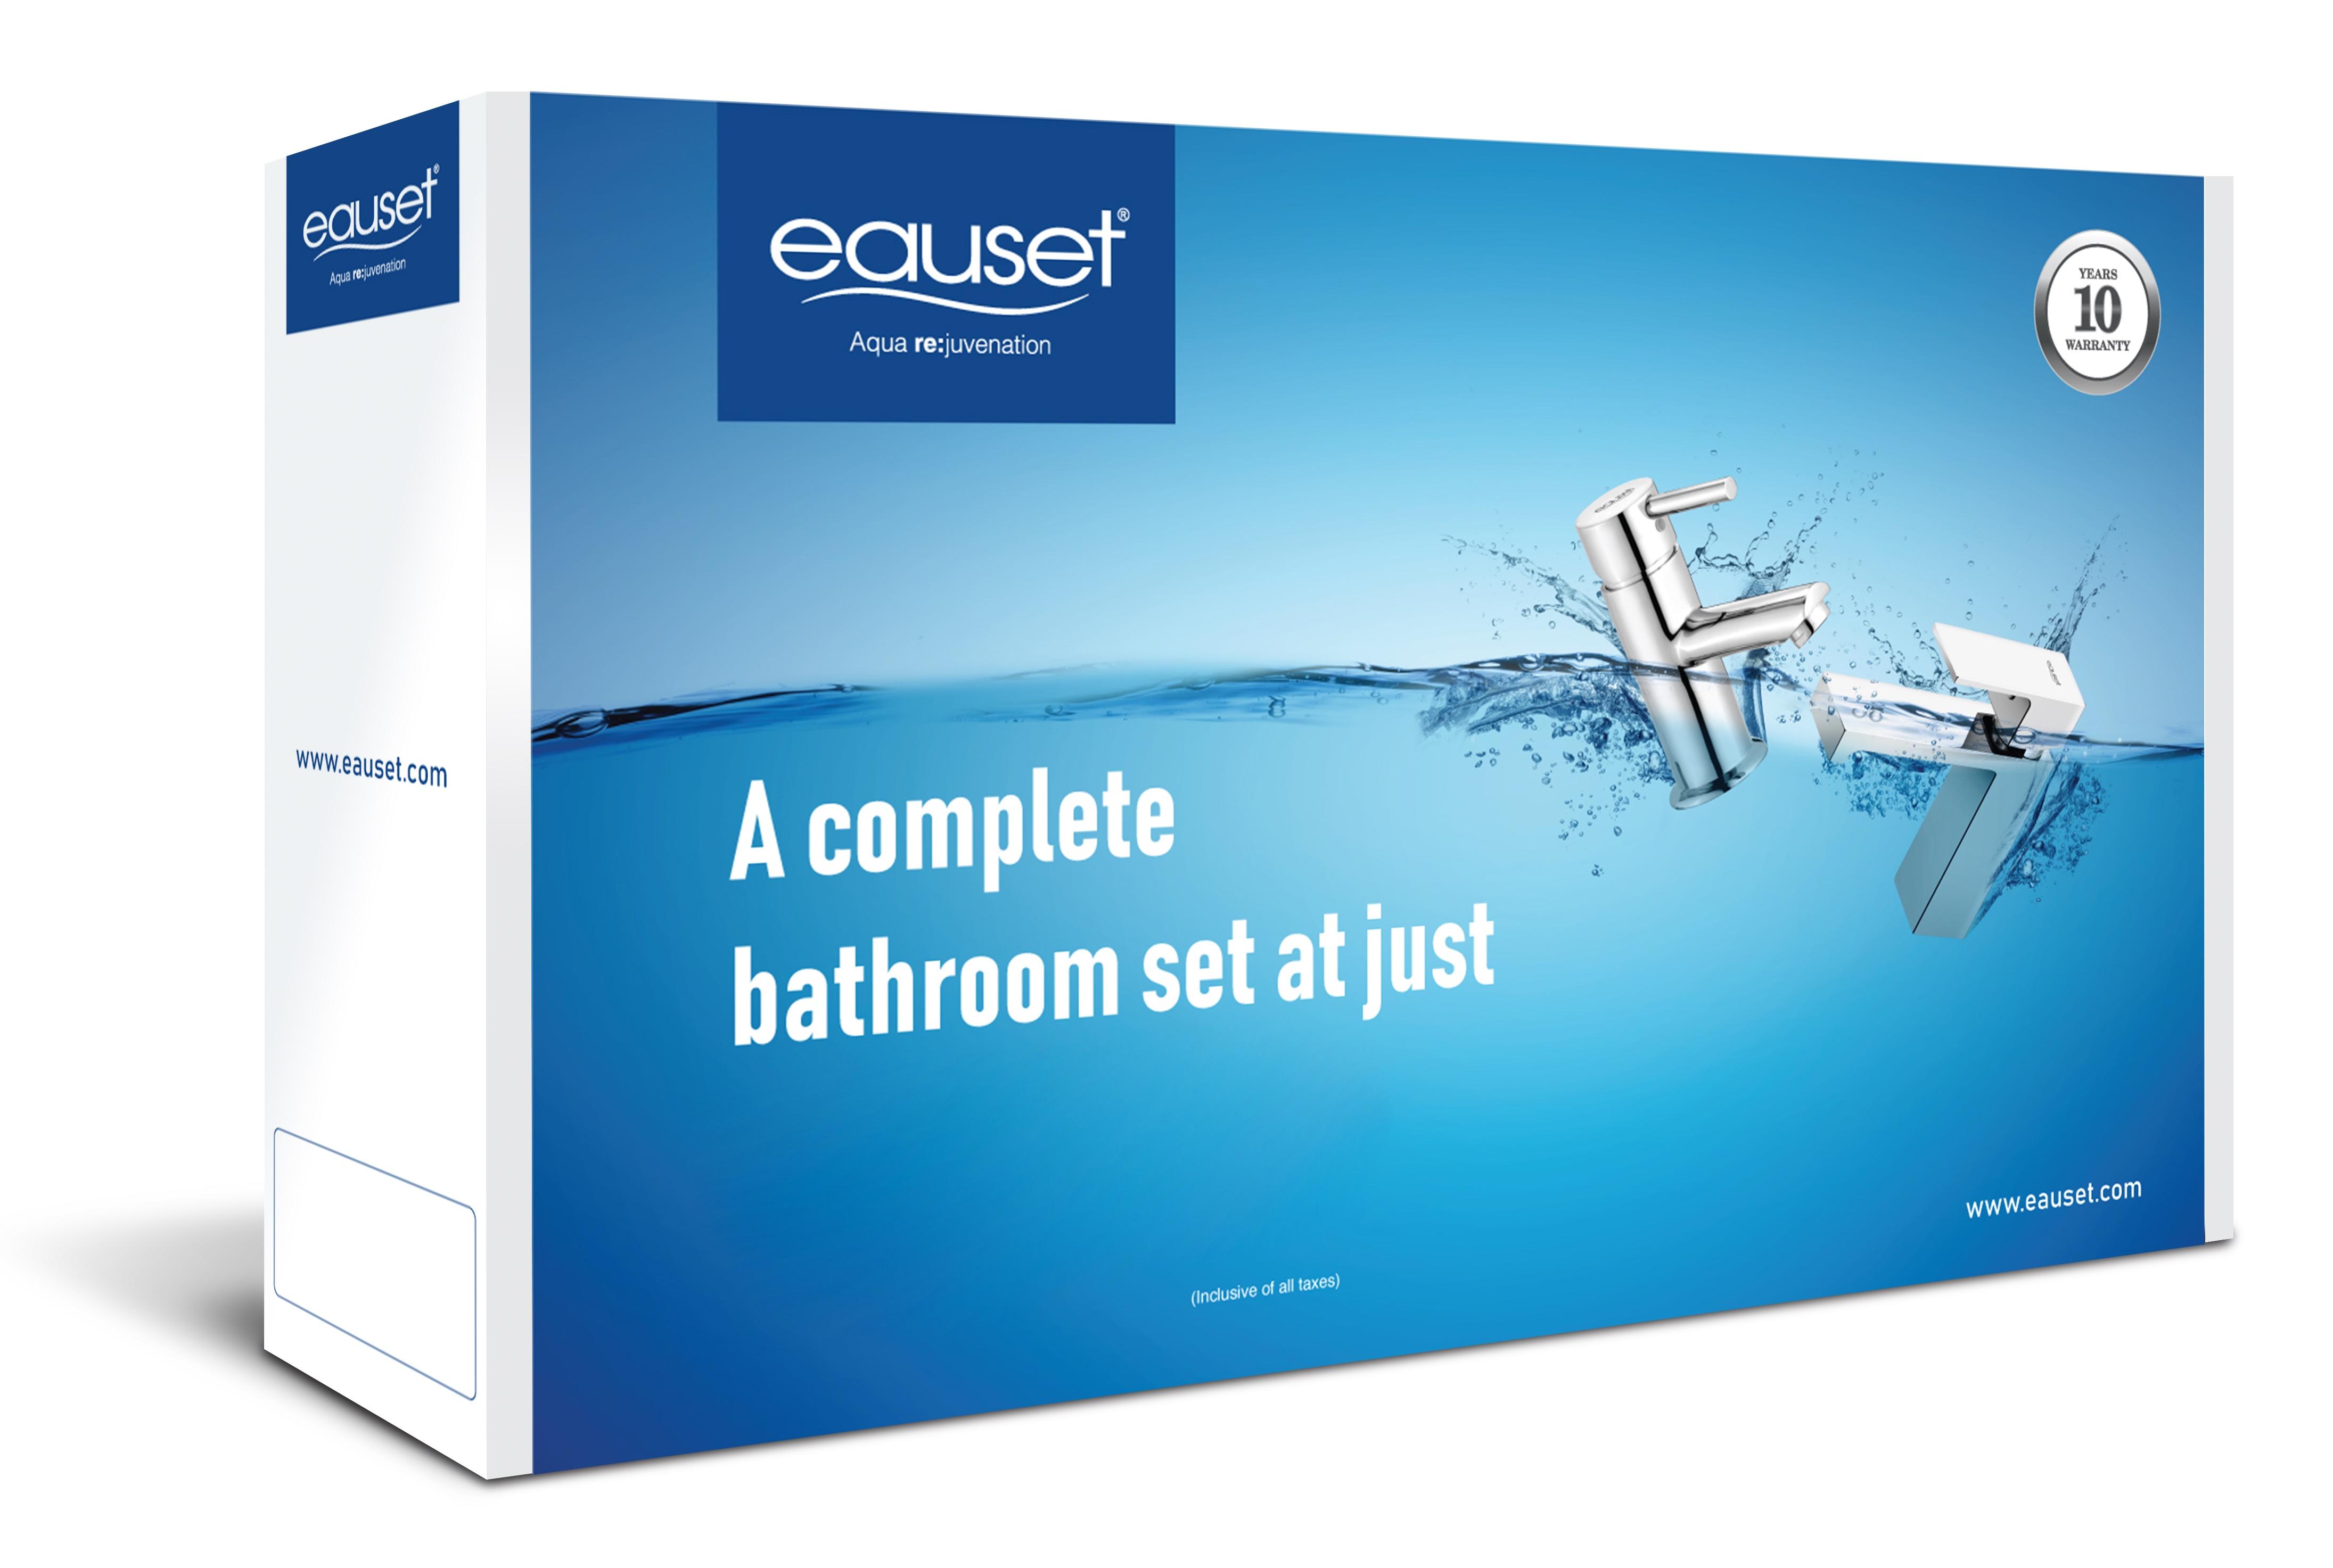 Bath Set - Pillar Cock Long Neck + Bath Tub Spout + Single Lever Cons Divertor with Upper Part + Angle Cock- 03 Pcs + Shower With Arm